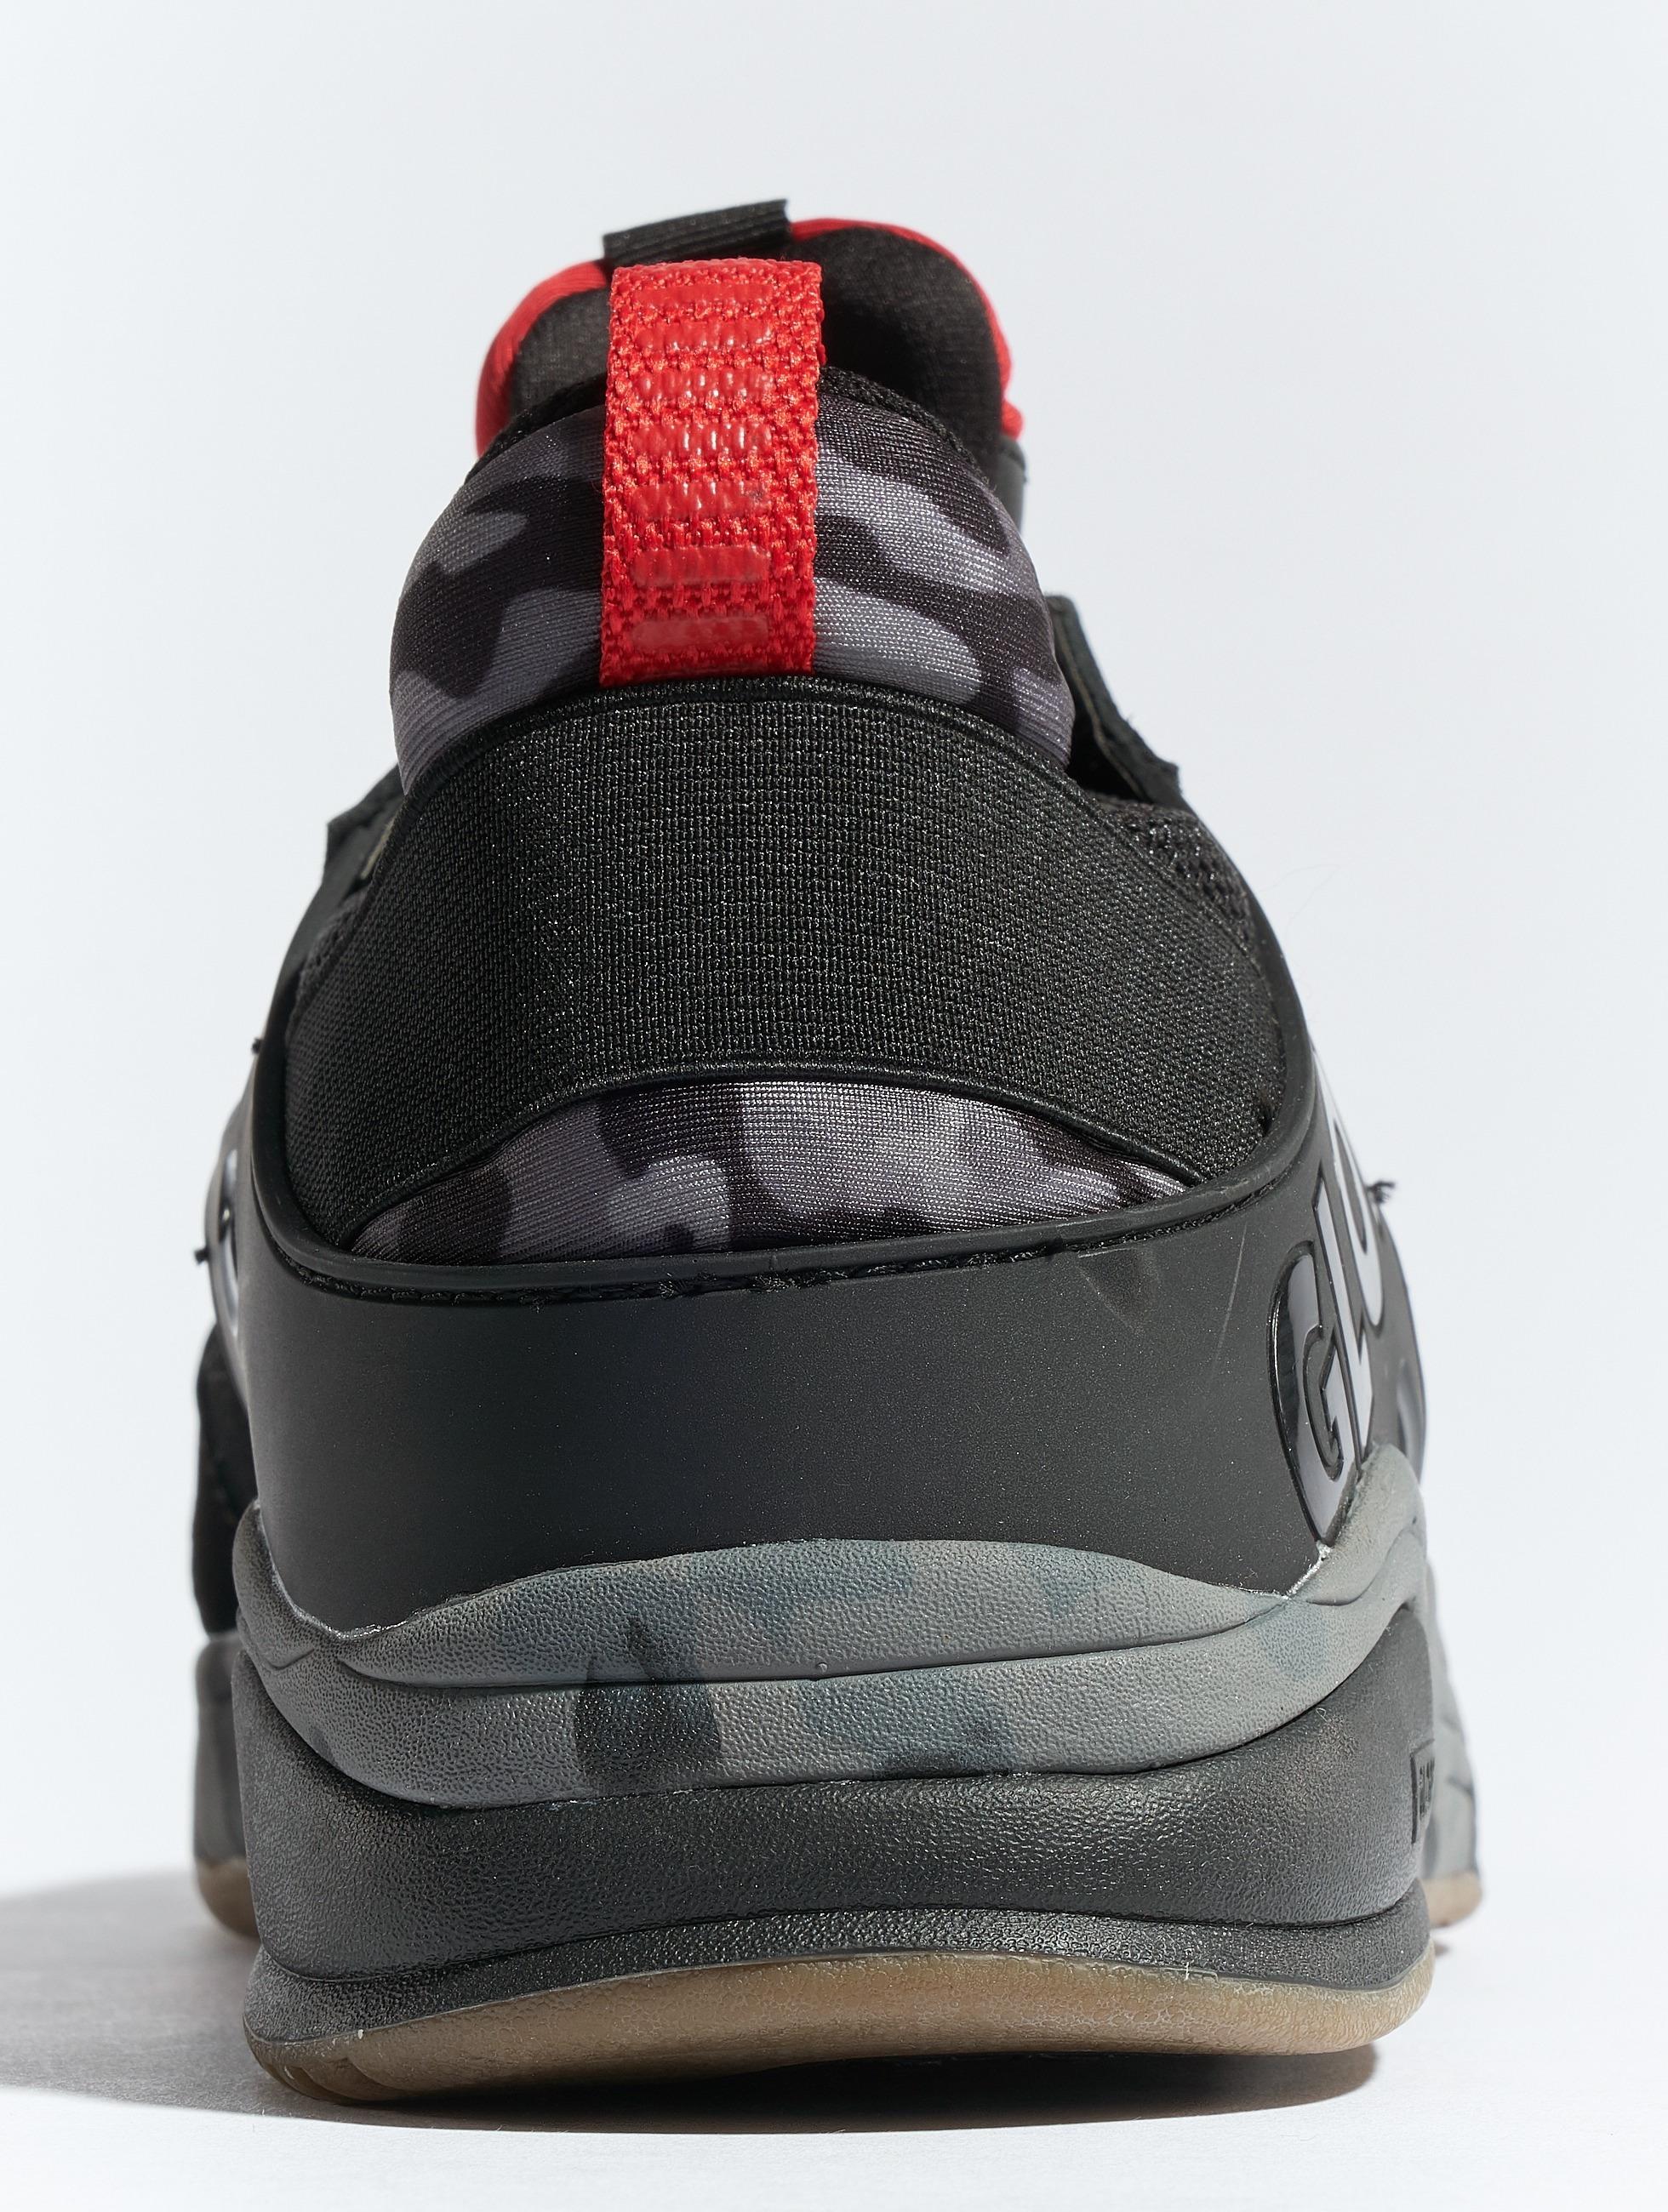 best service d5649 b228d ... Nike KD 8 EXT Sail Chrome Black Black Black Woven Gum Bottom SZ 7 ...